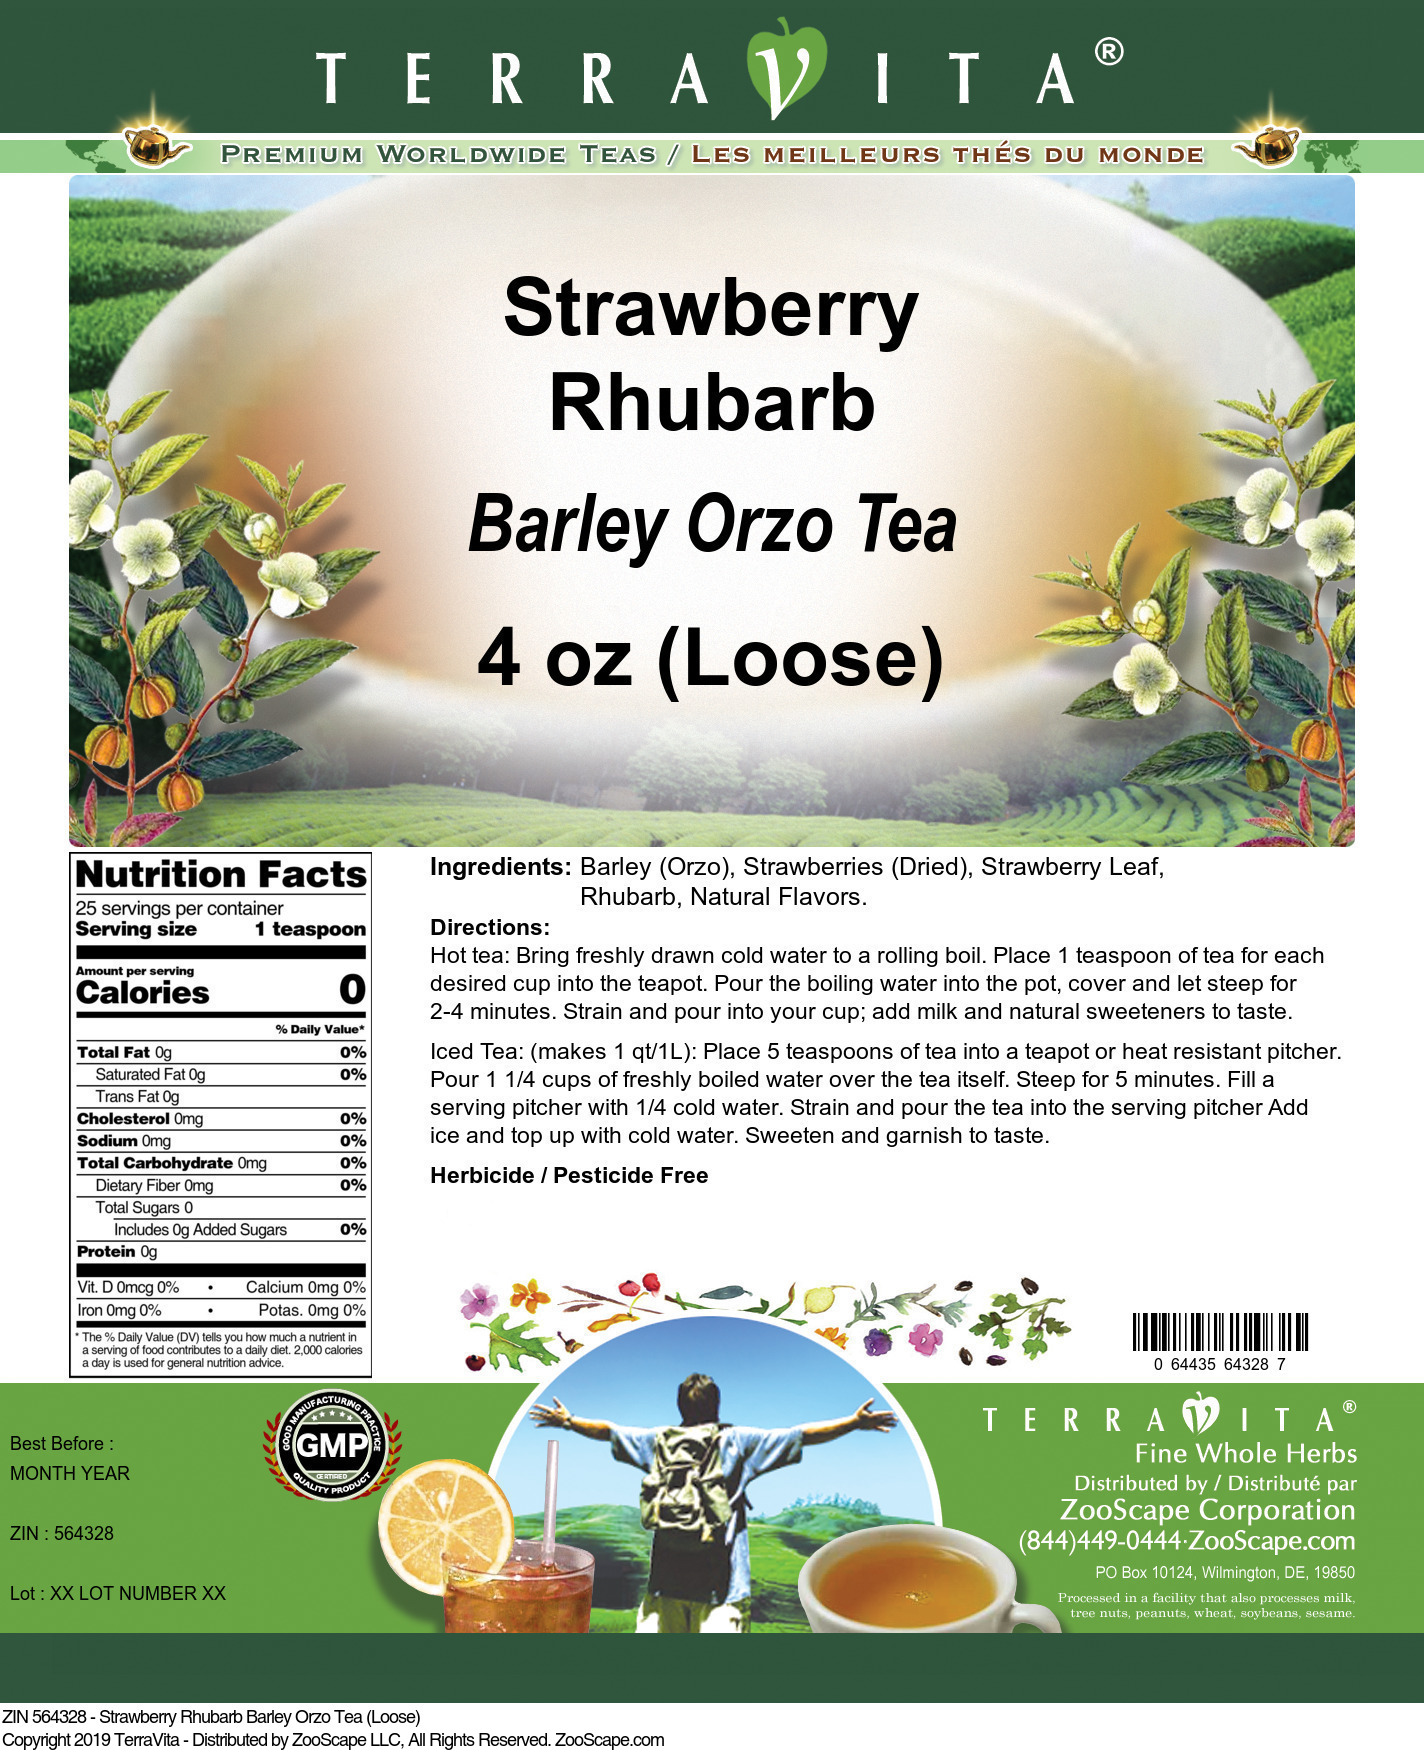 Strawberry Rhubarb Barley Orzo Tea (Loose)